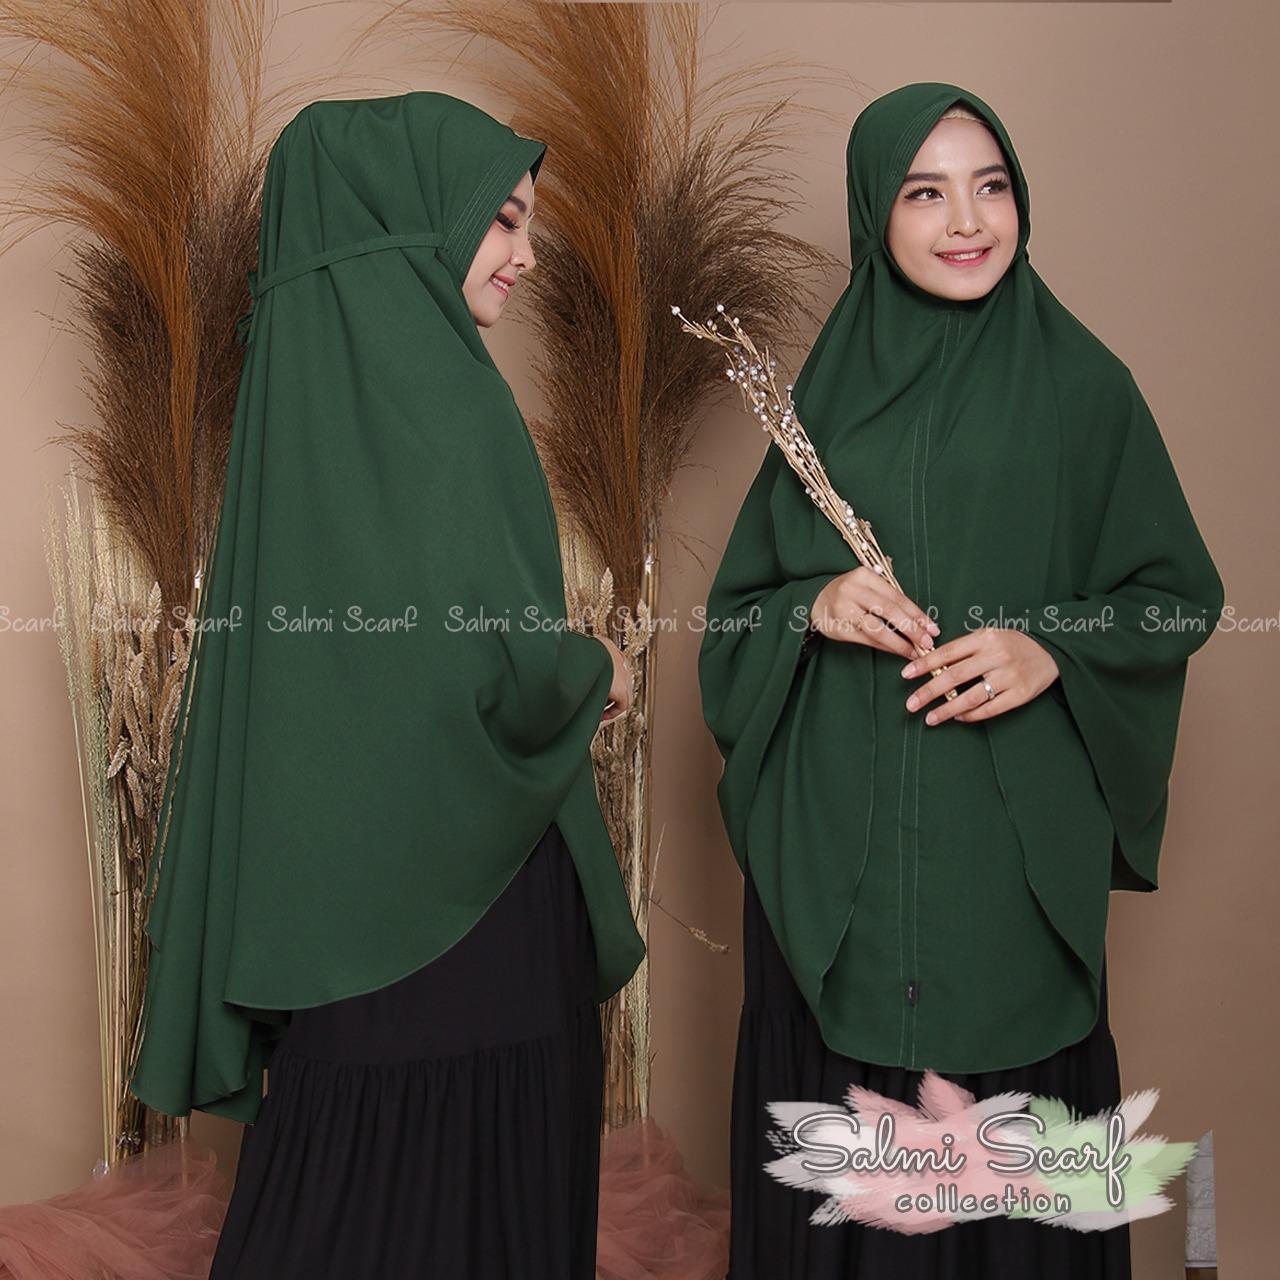 Salmi Scraf -COD KHIMAR TALI JUMBO WOLPIS / Hijab Instan / Hijab Syar'i terbaru / Jilbab Syar'i / Fashion Wanita Murah / Kerudung Wanita